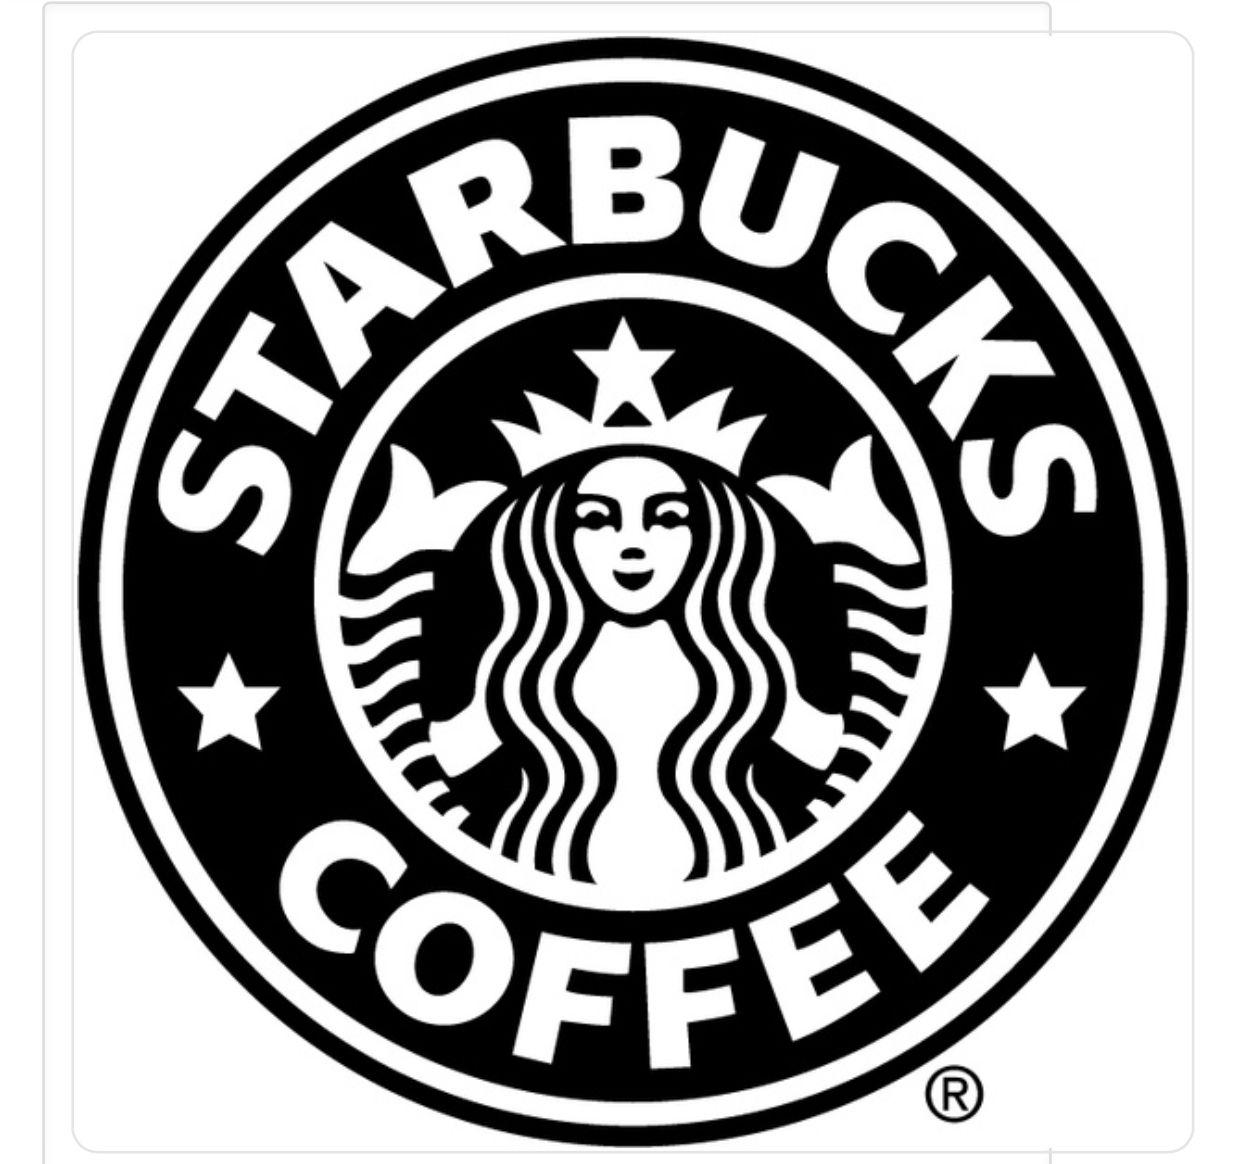 Pin by Darla Marchenkuski on Svg Starbucks drawing